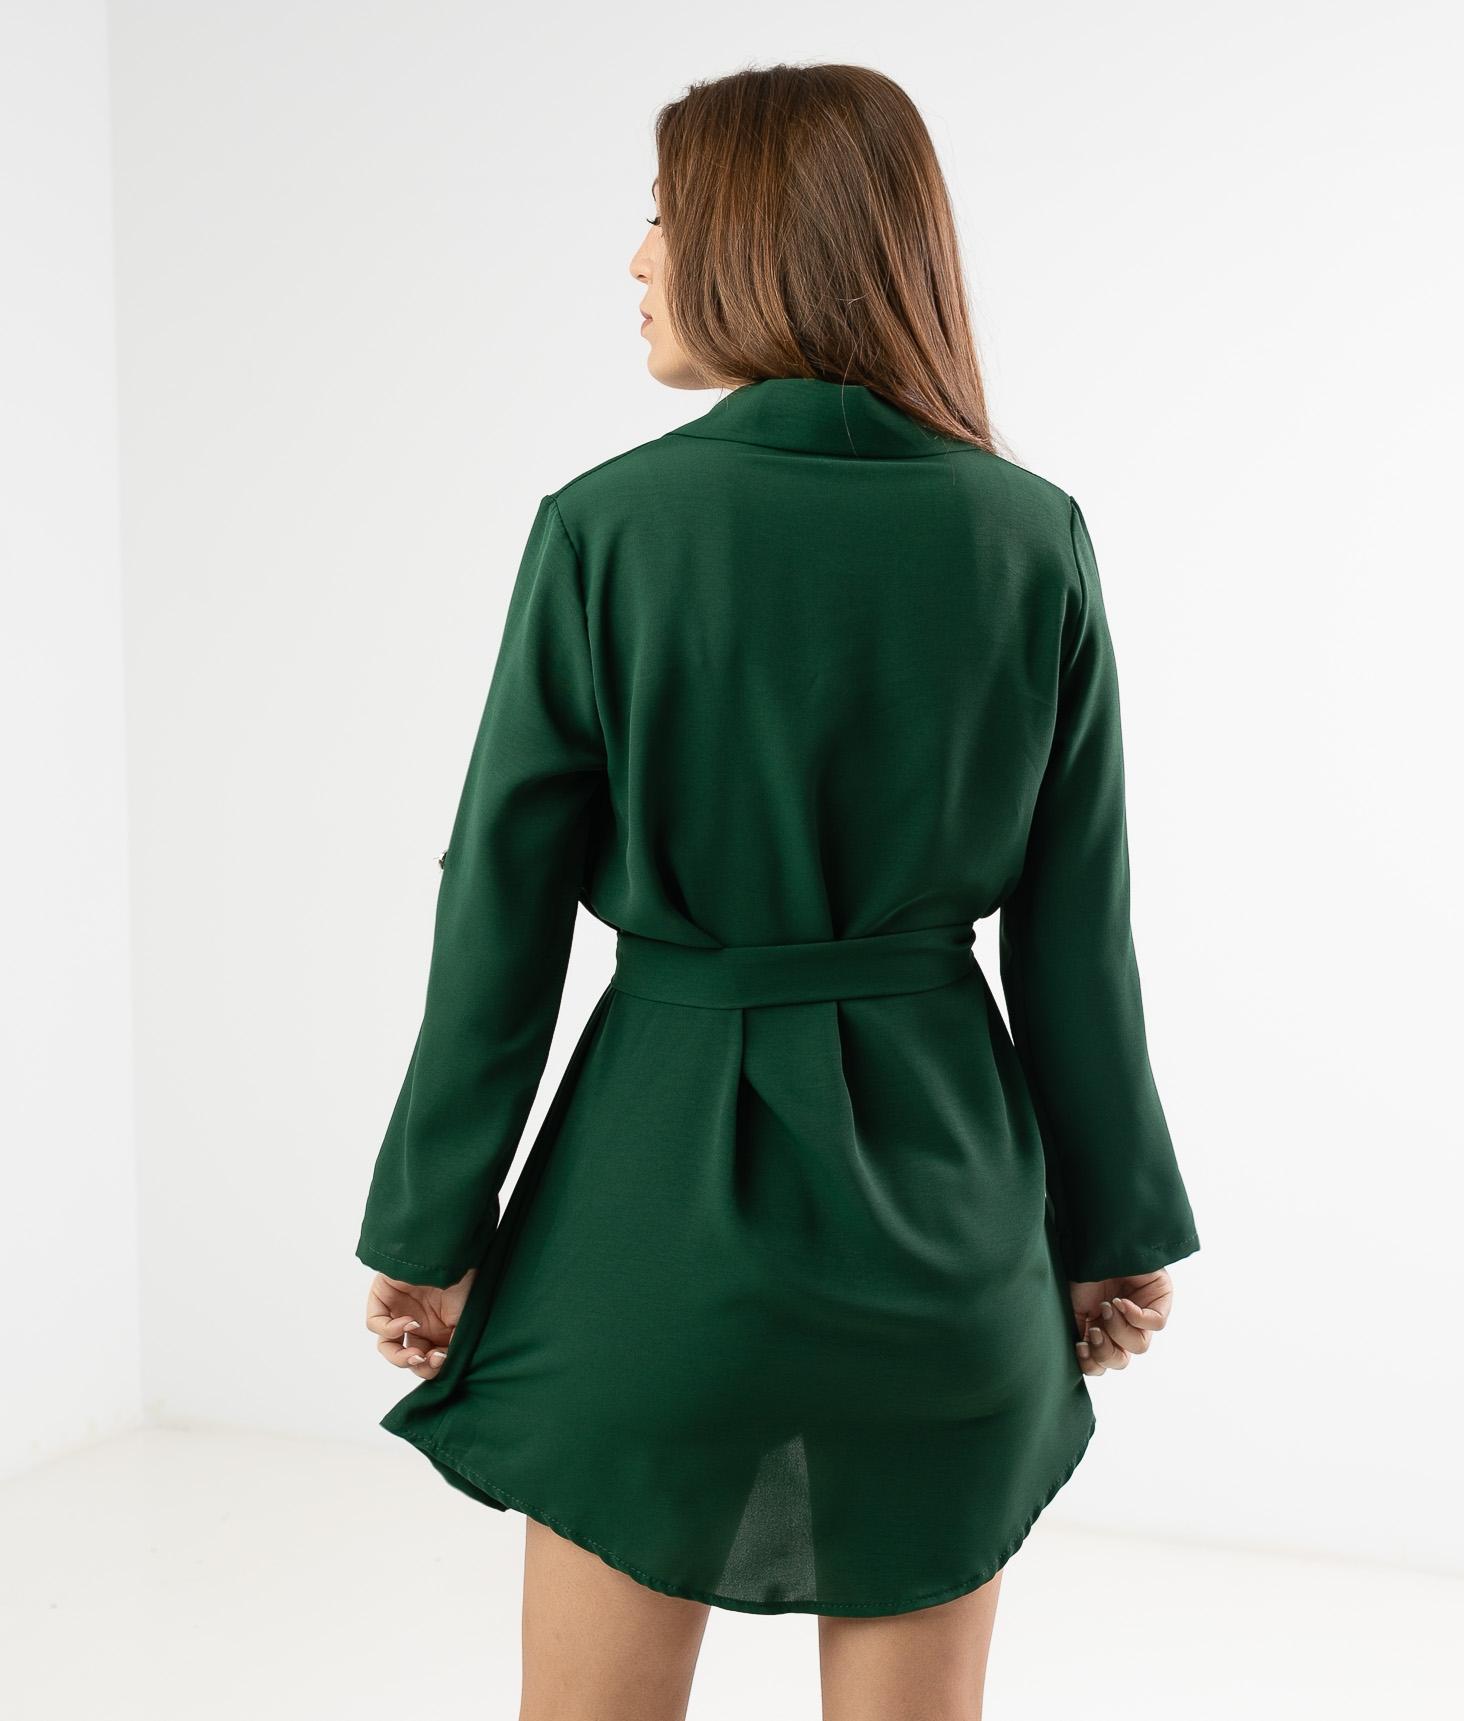 JOLAR DRESS - GREEN